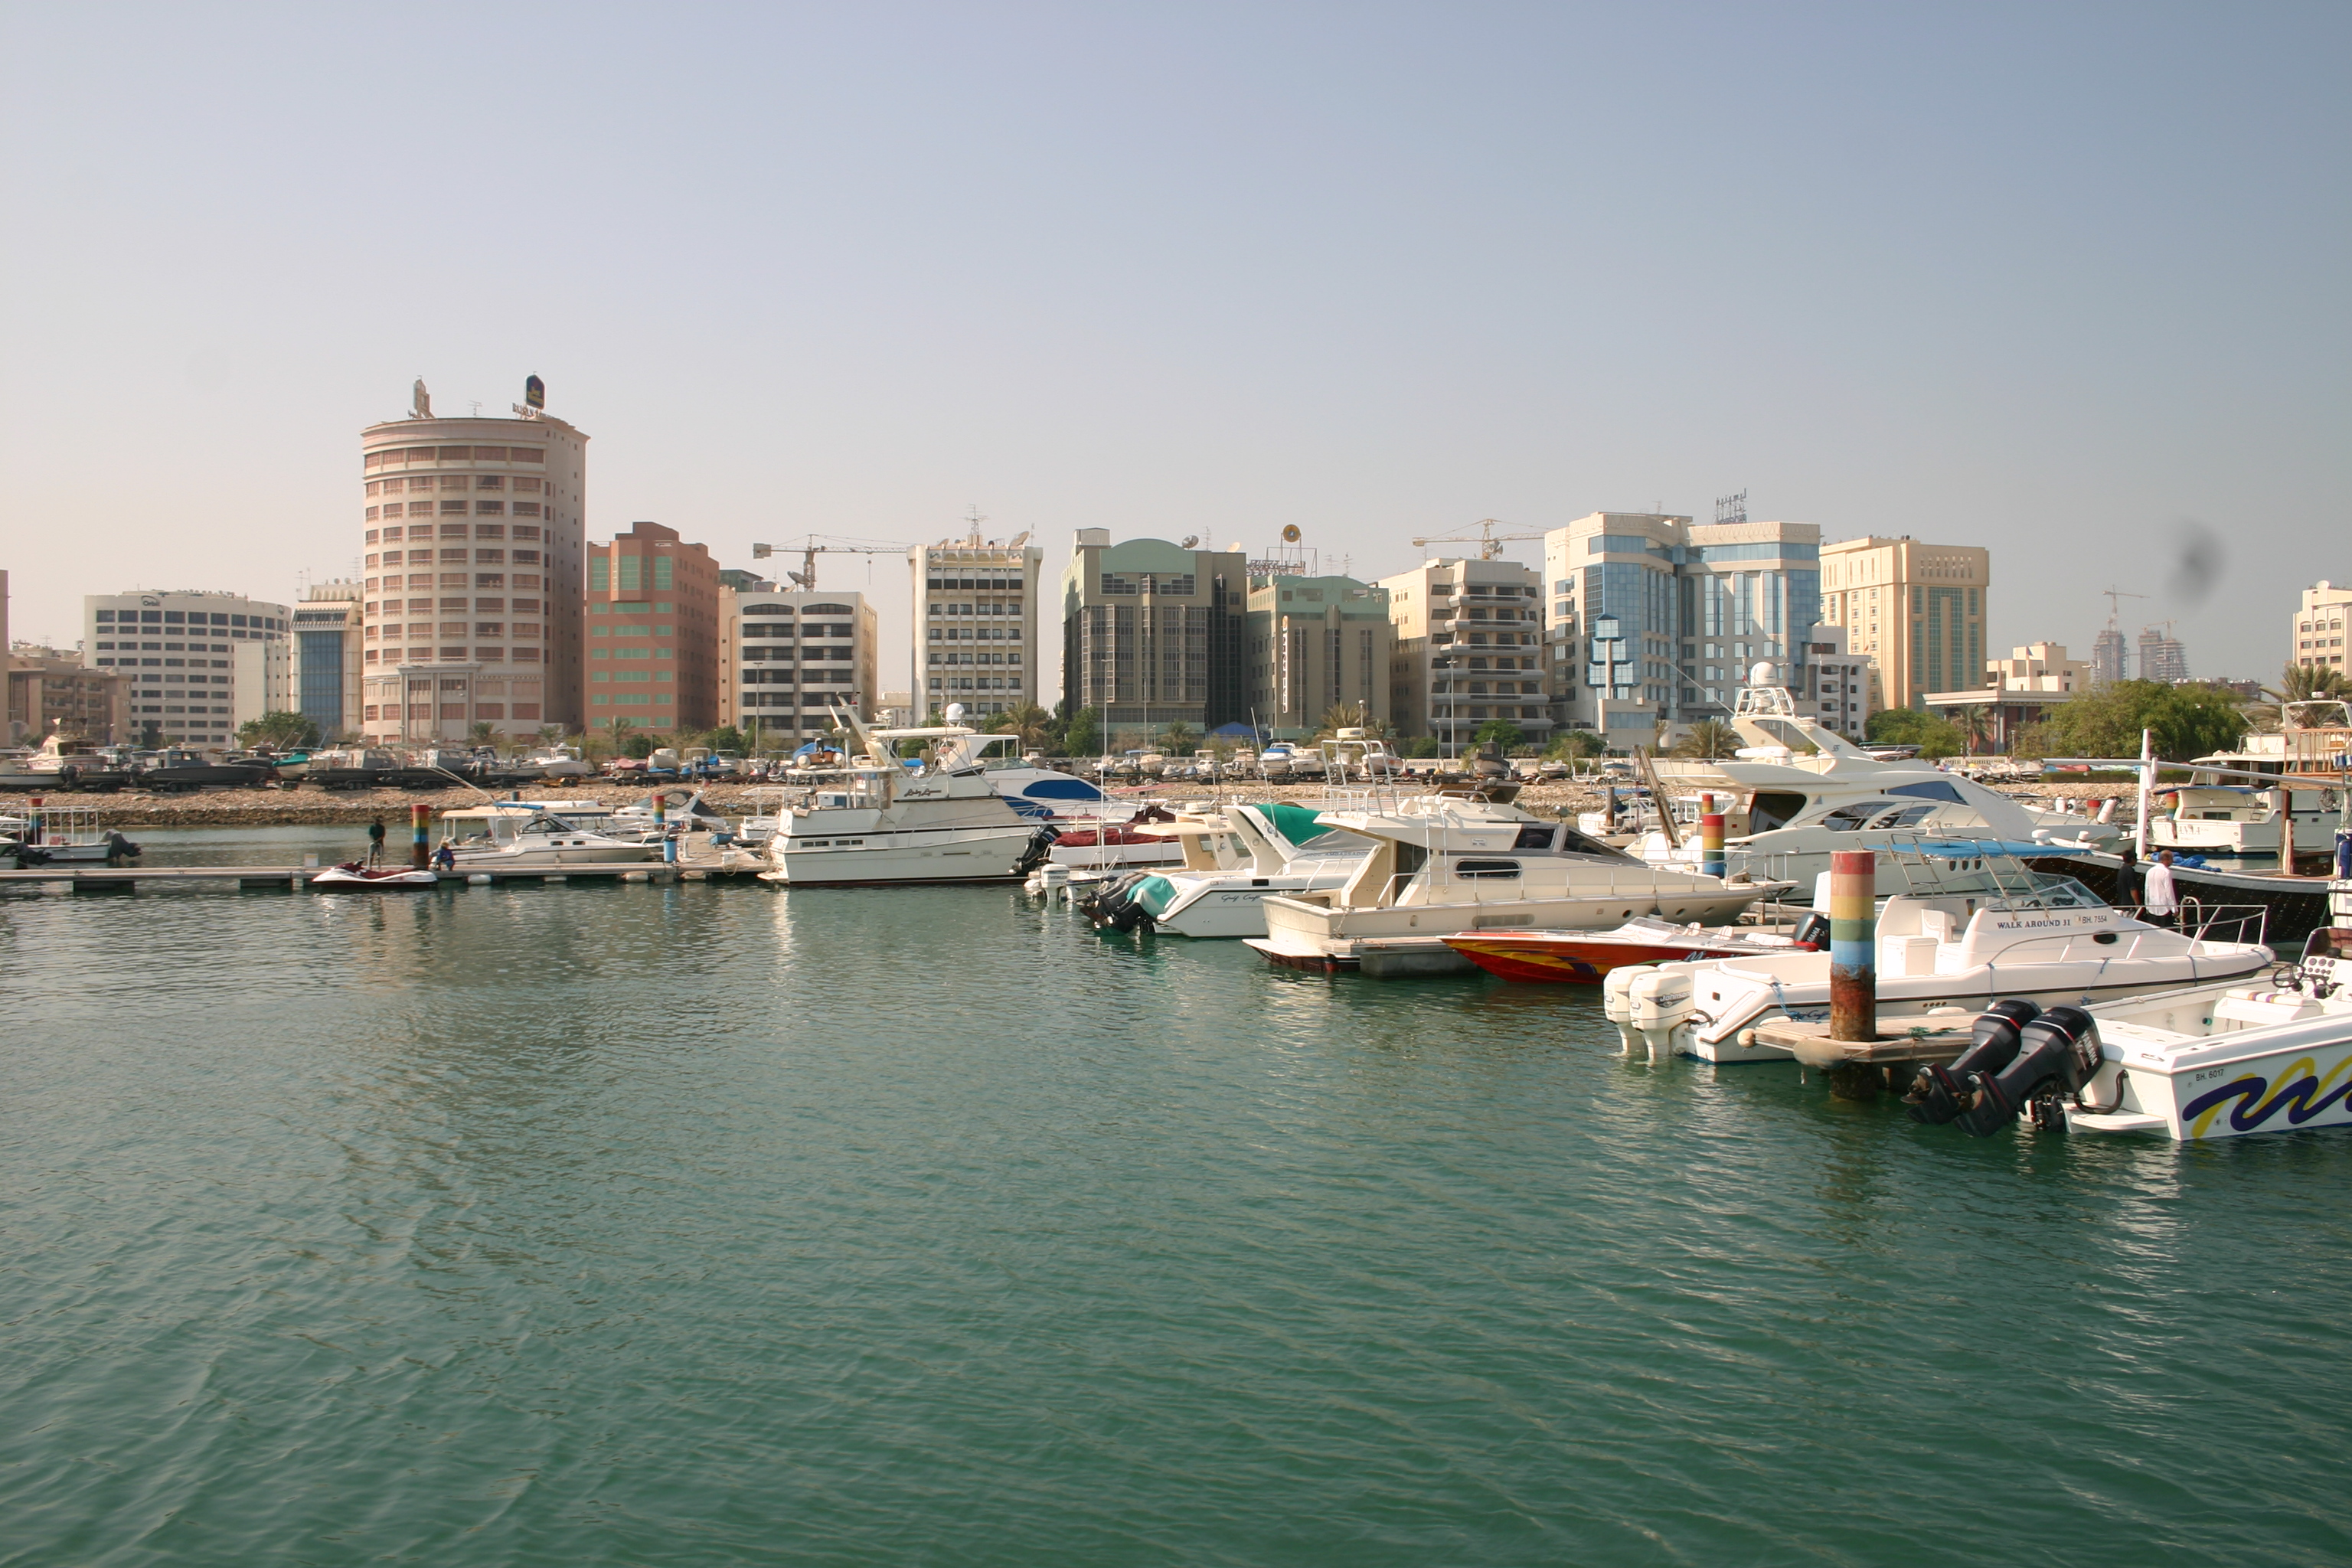 File:Modern Manama.jpg - Wikipedia, the free encyclopedia